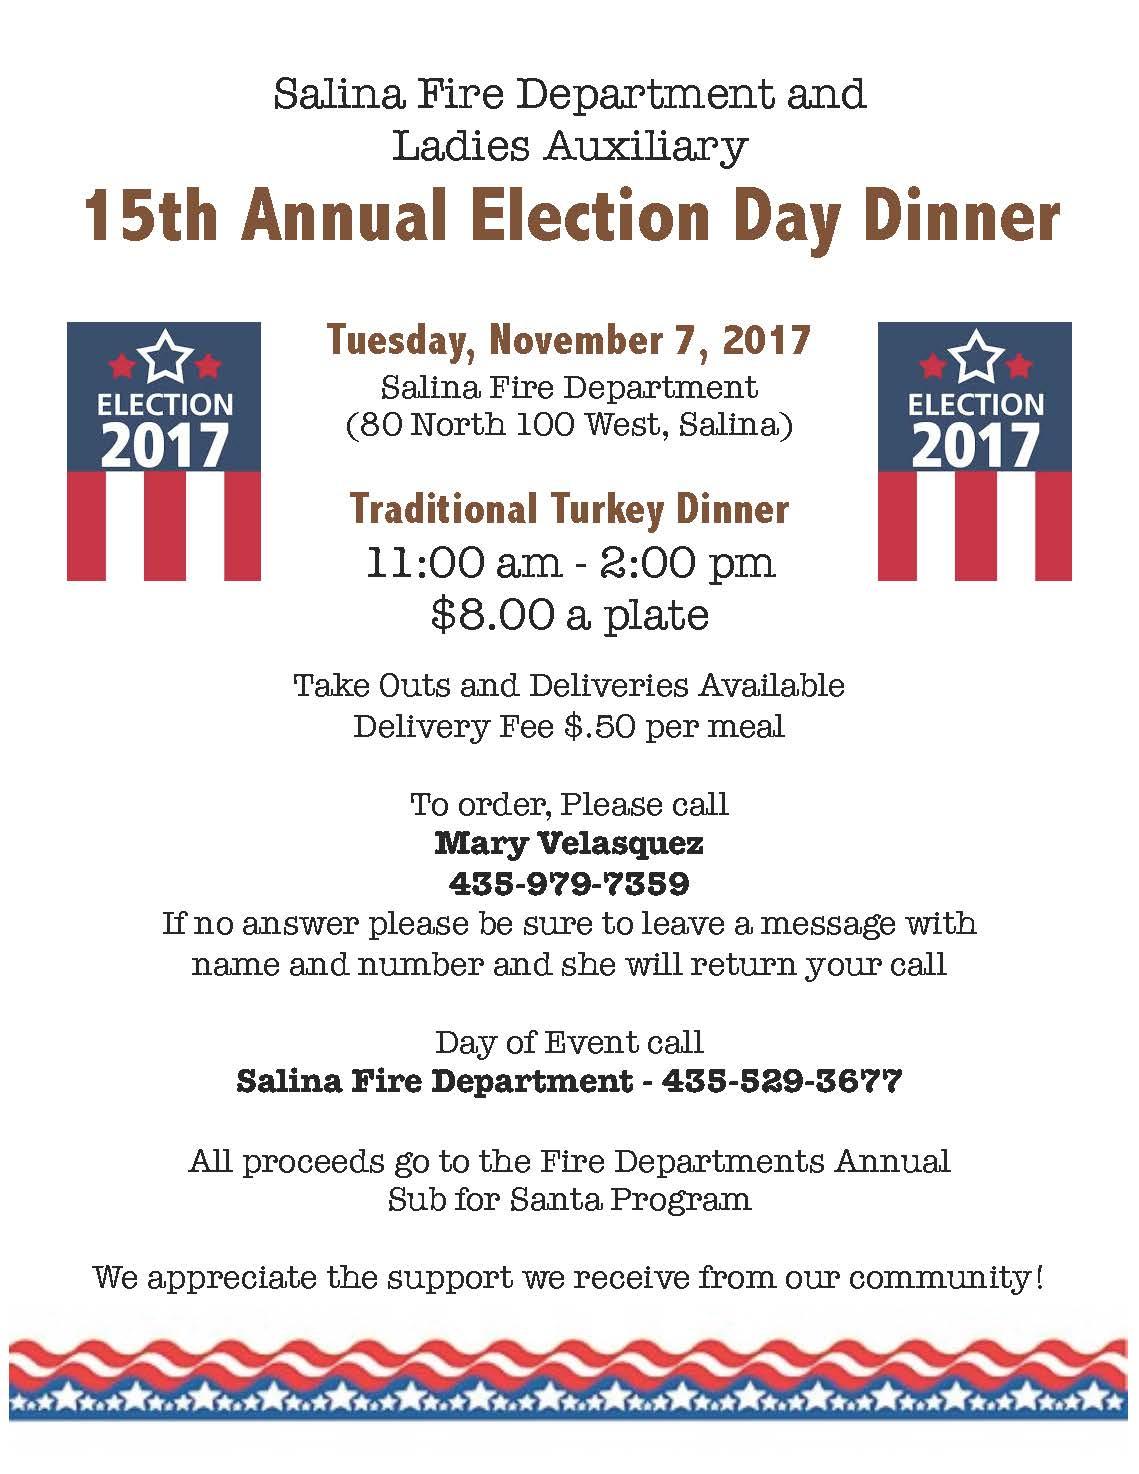 2017 Election Day Dinner - Salina City